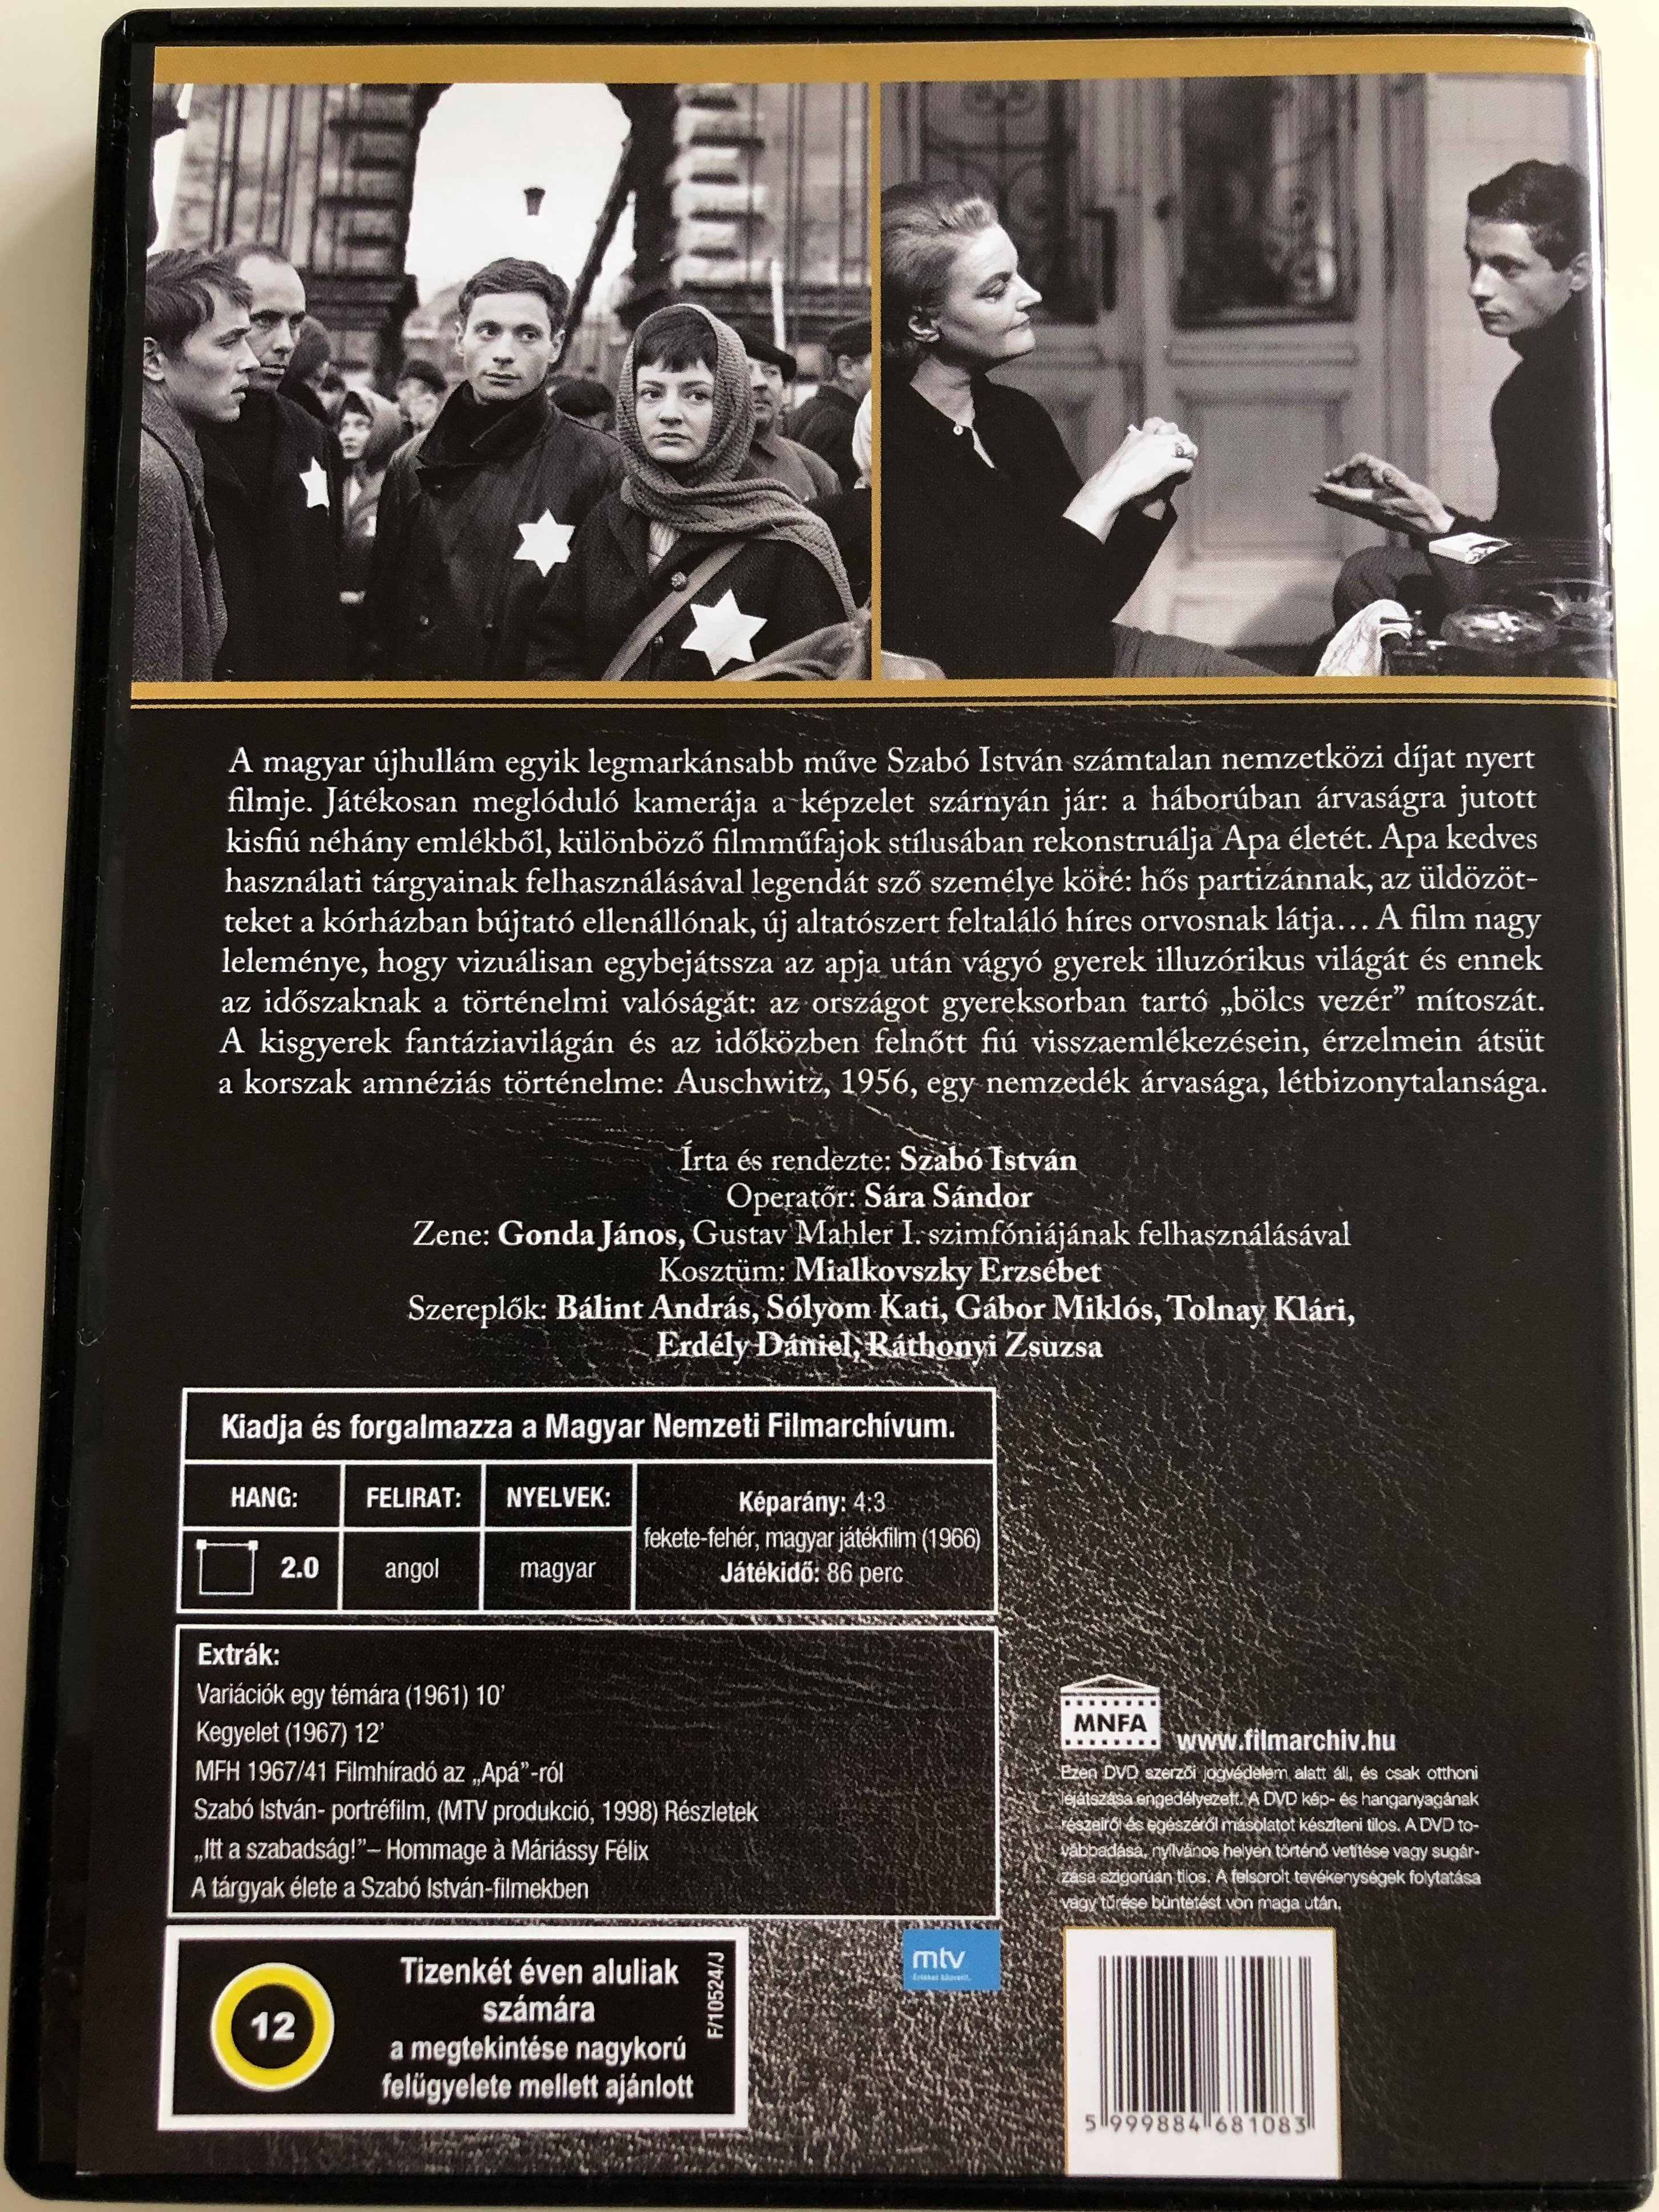 apa-egy-hit-napl-ja-dvd-1966-dad-diary-of-faith-directed-written-by-szab-istv-n-starring-b-lint-andr-s-s-lyom-kati-g-bor-mikl-s-tolnay-kl-ri-erd-ly-d-niel-r-thonyi-zsuzsa-2-.jpg